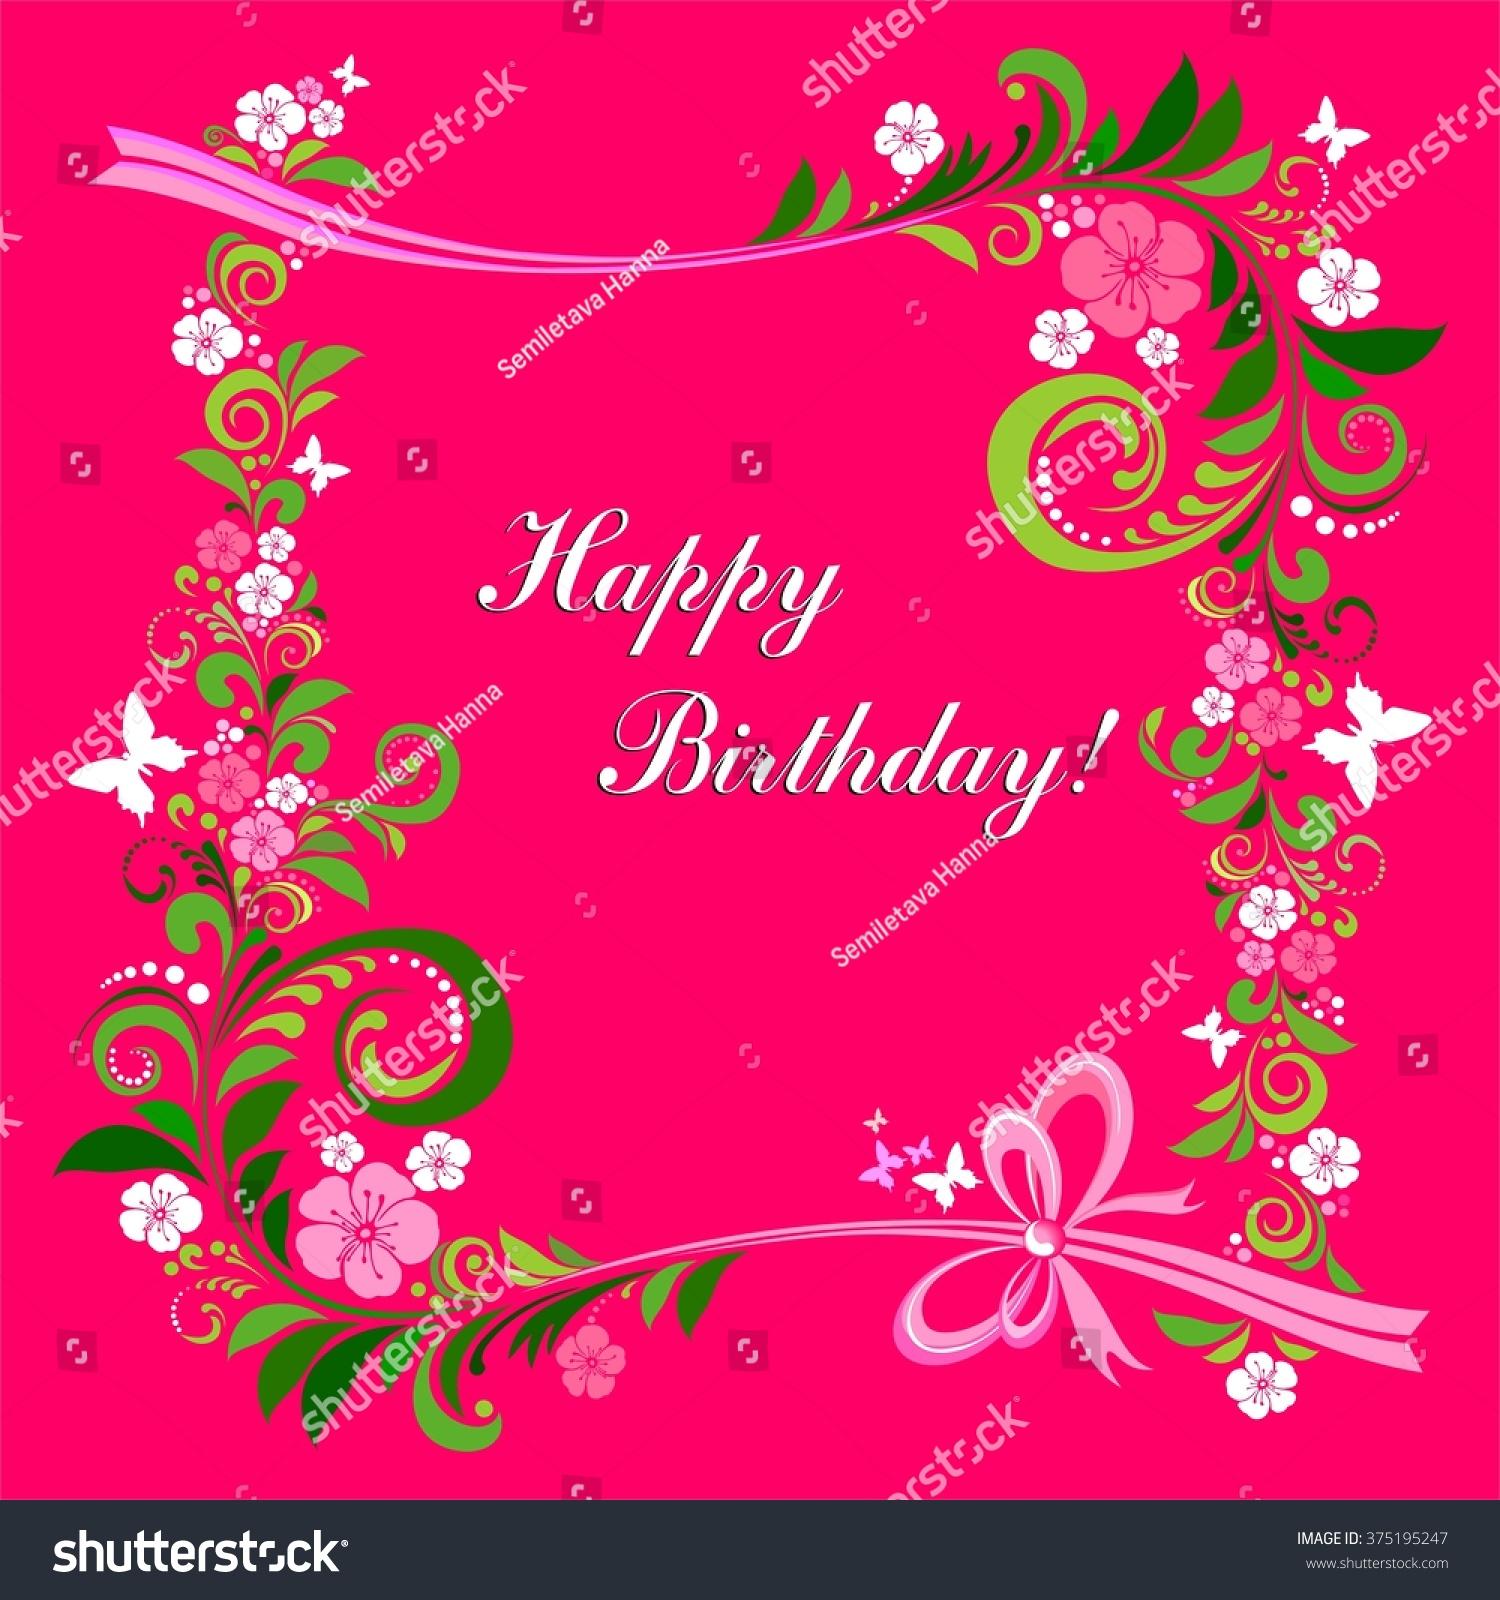 Happy Birthday Card Celebration Pink Background Stock